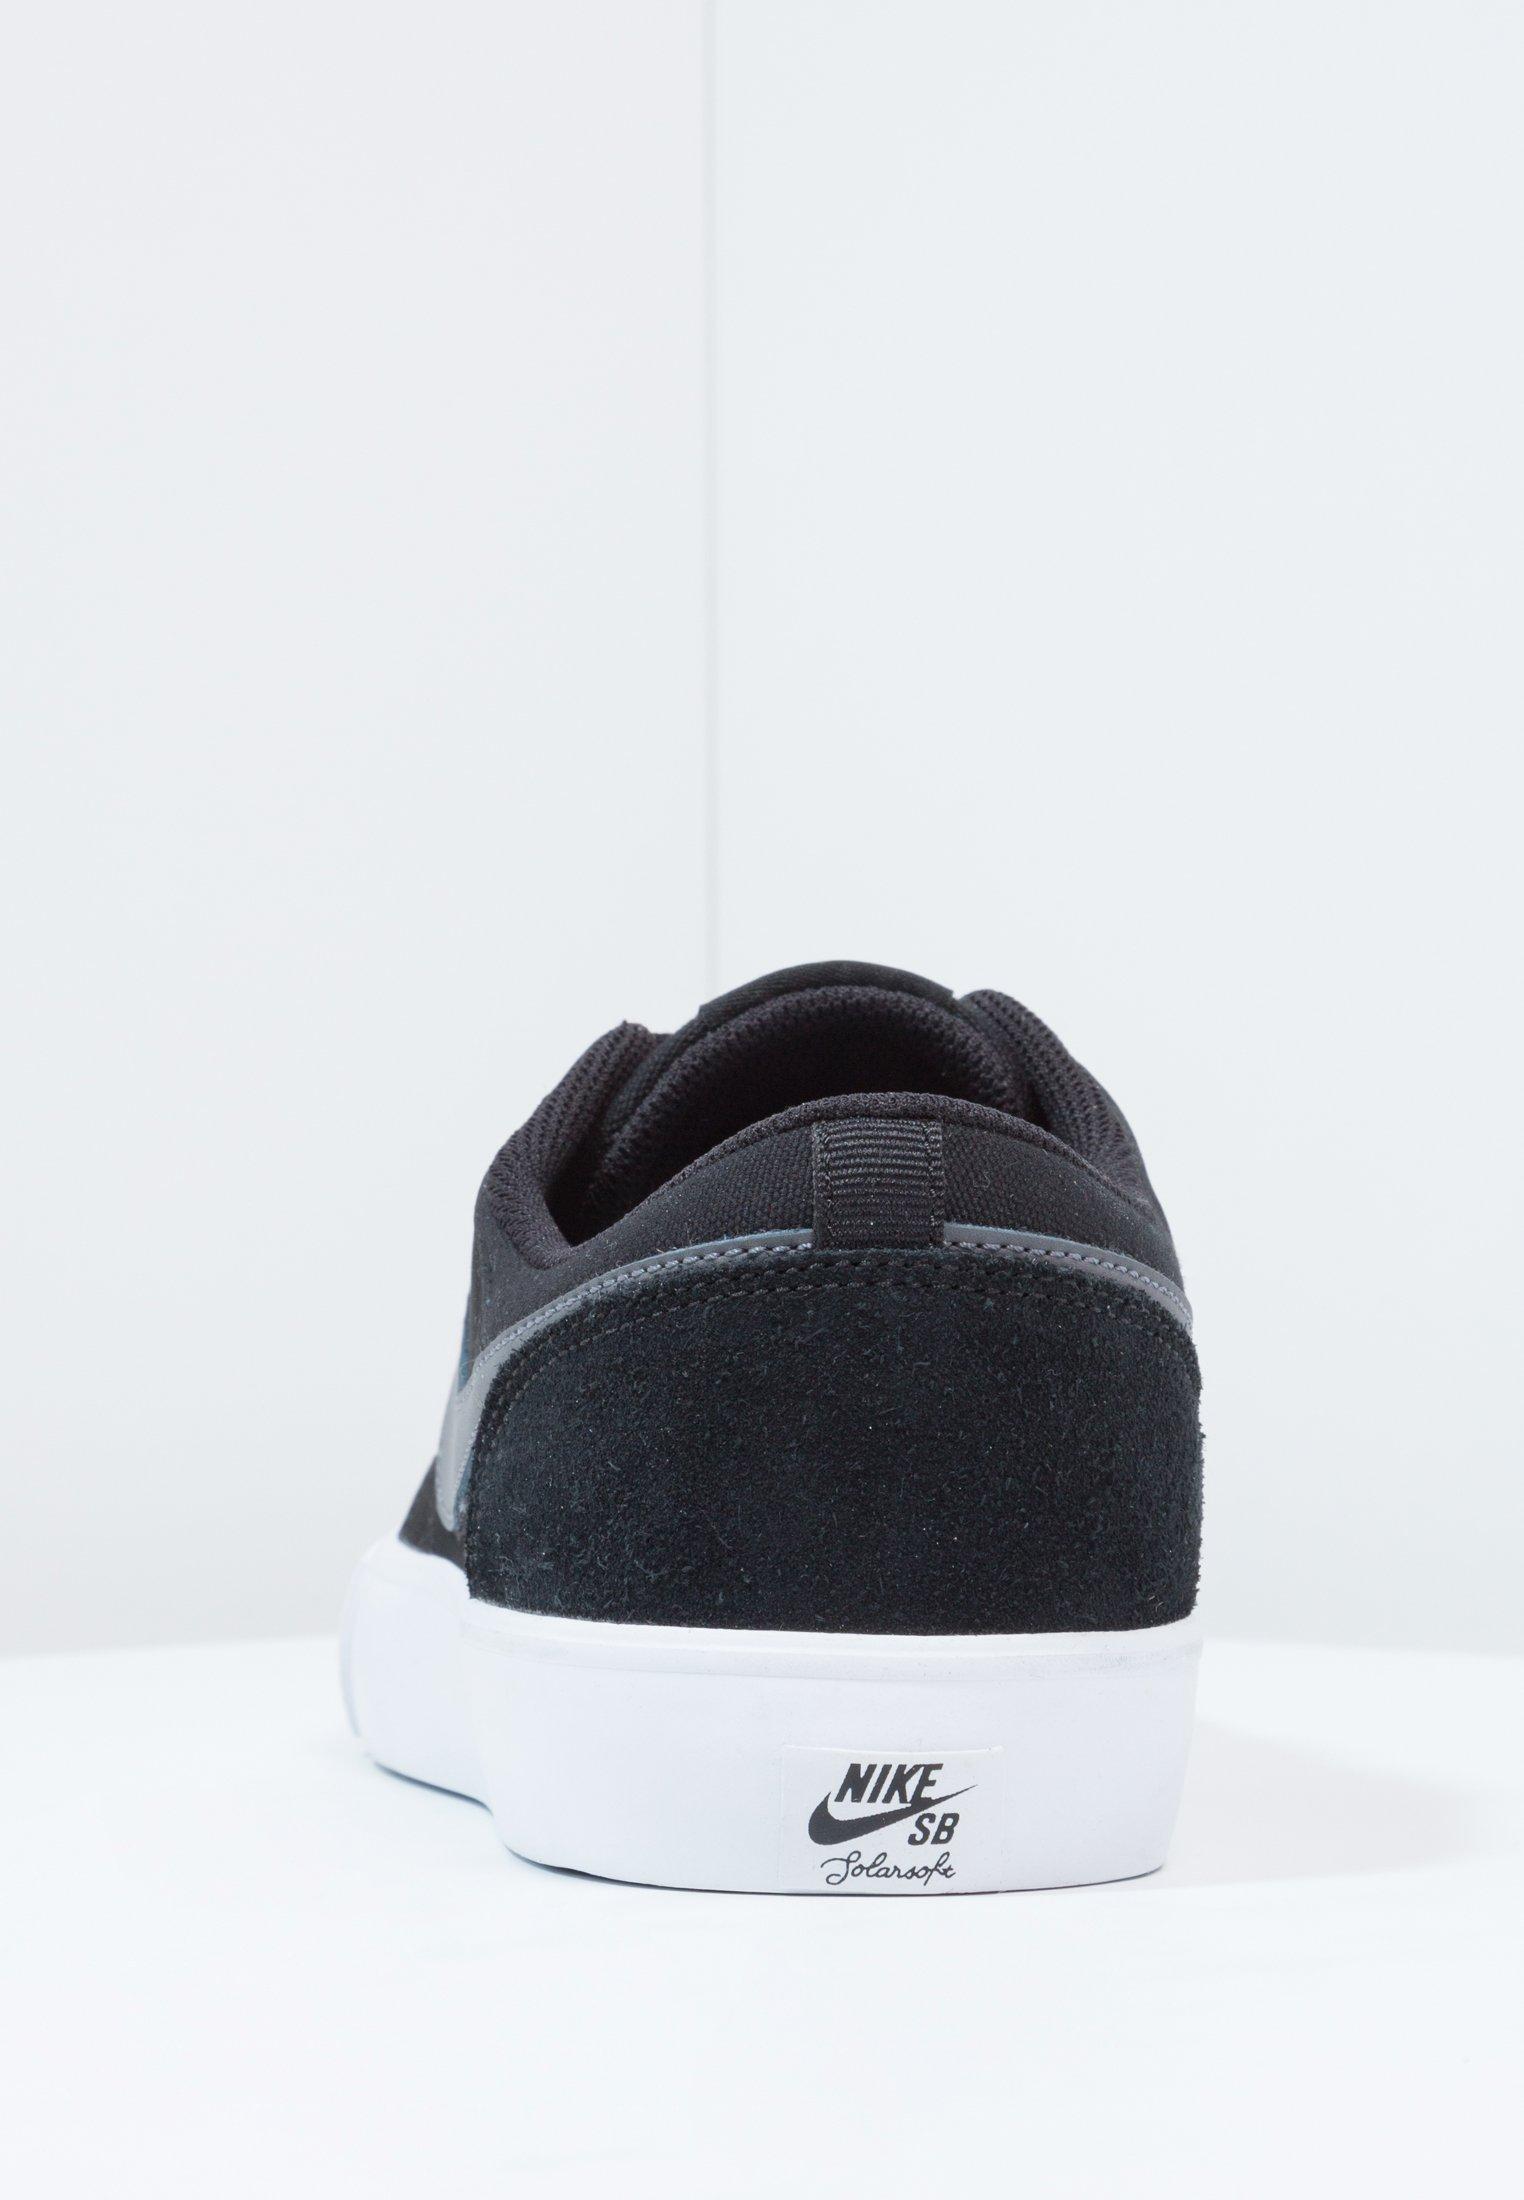 PORTMORE II SOLAR Chaussures de skate blackdark greywhite